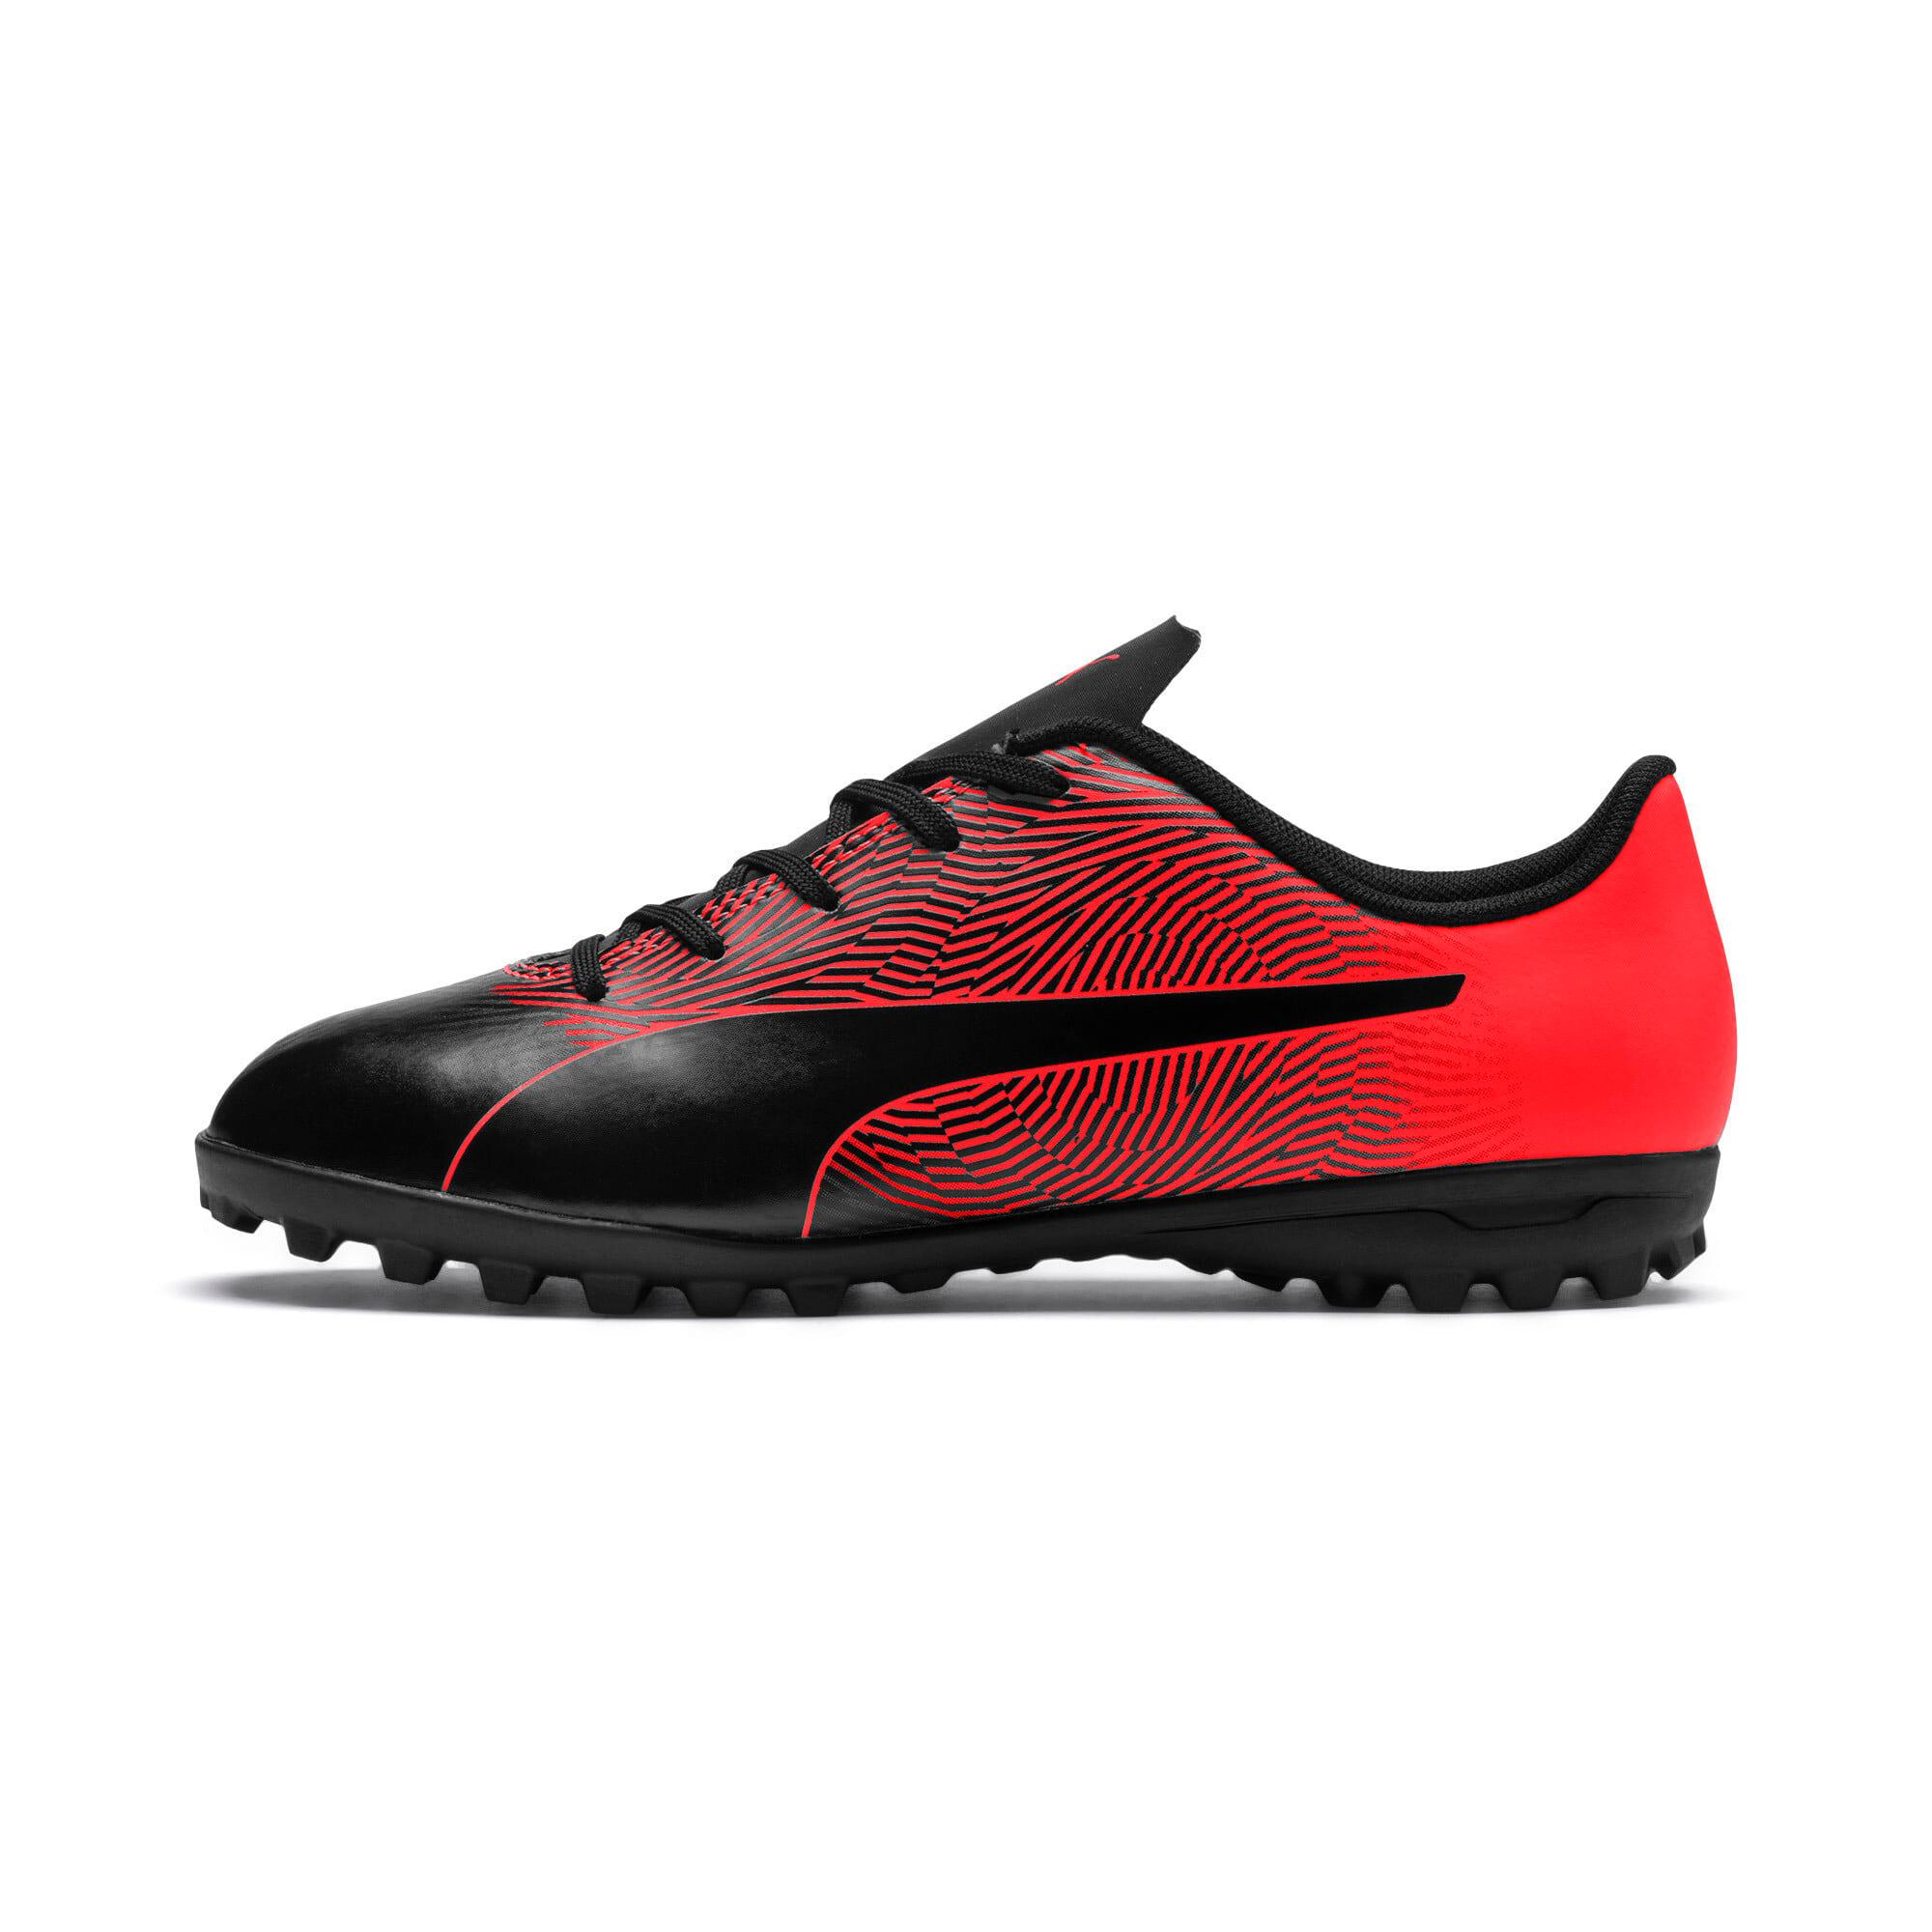 Miniatura 1 de Zapatos de fútbolPUMA Spirit II TT para JR, Puma Black-Red Blast, mediano